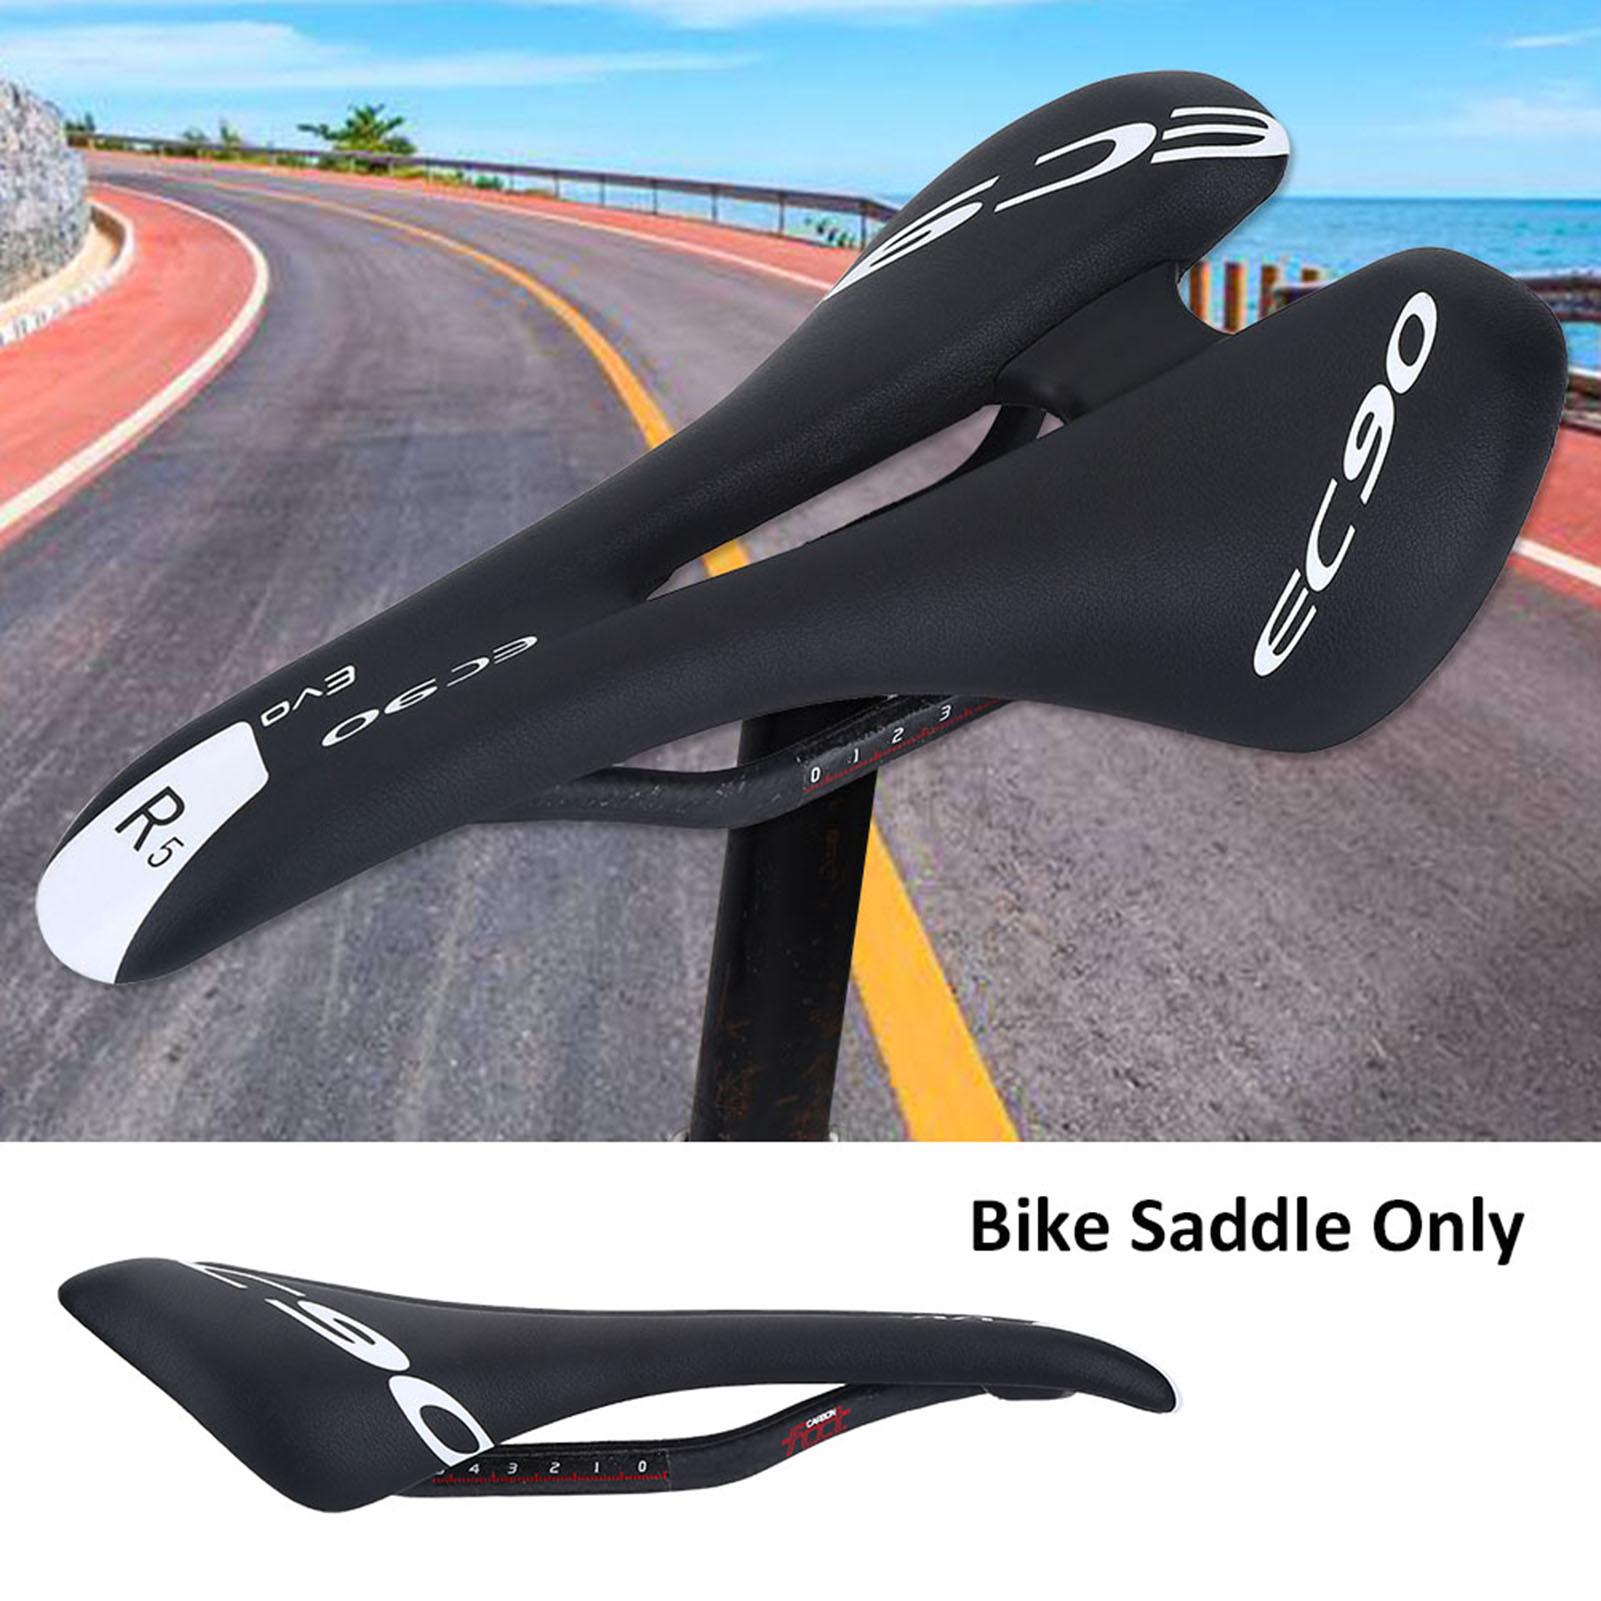 Ultra-ligero-Asiento-Sillin-Montana-Bicicleta-Deporte-Carratera-Fibra-Reemplazo